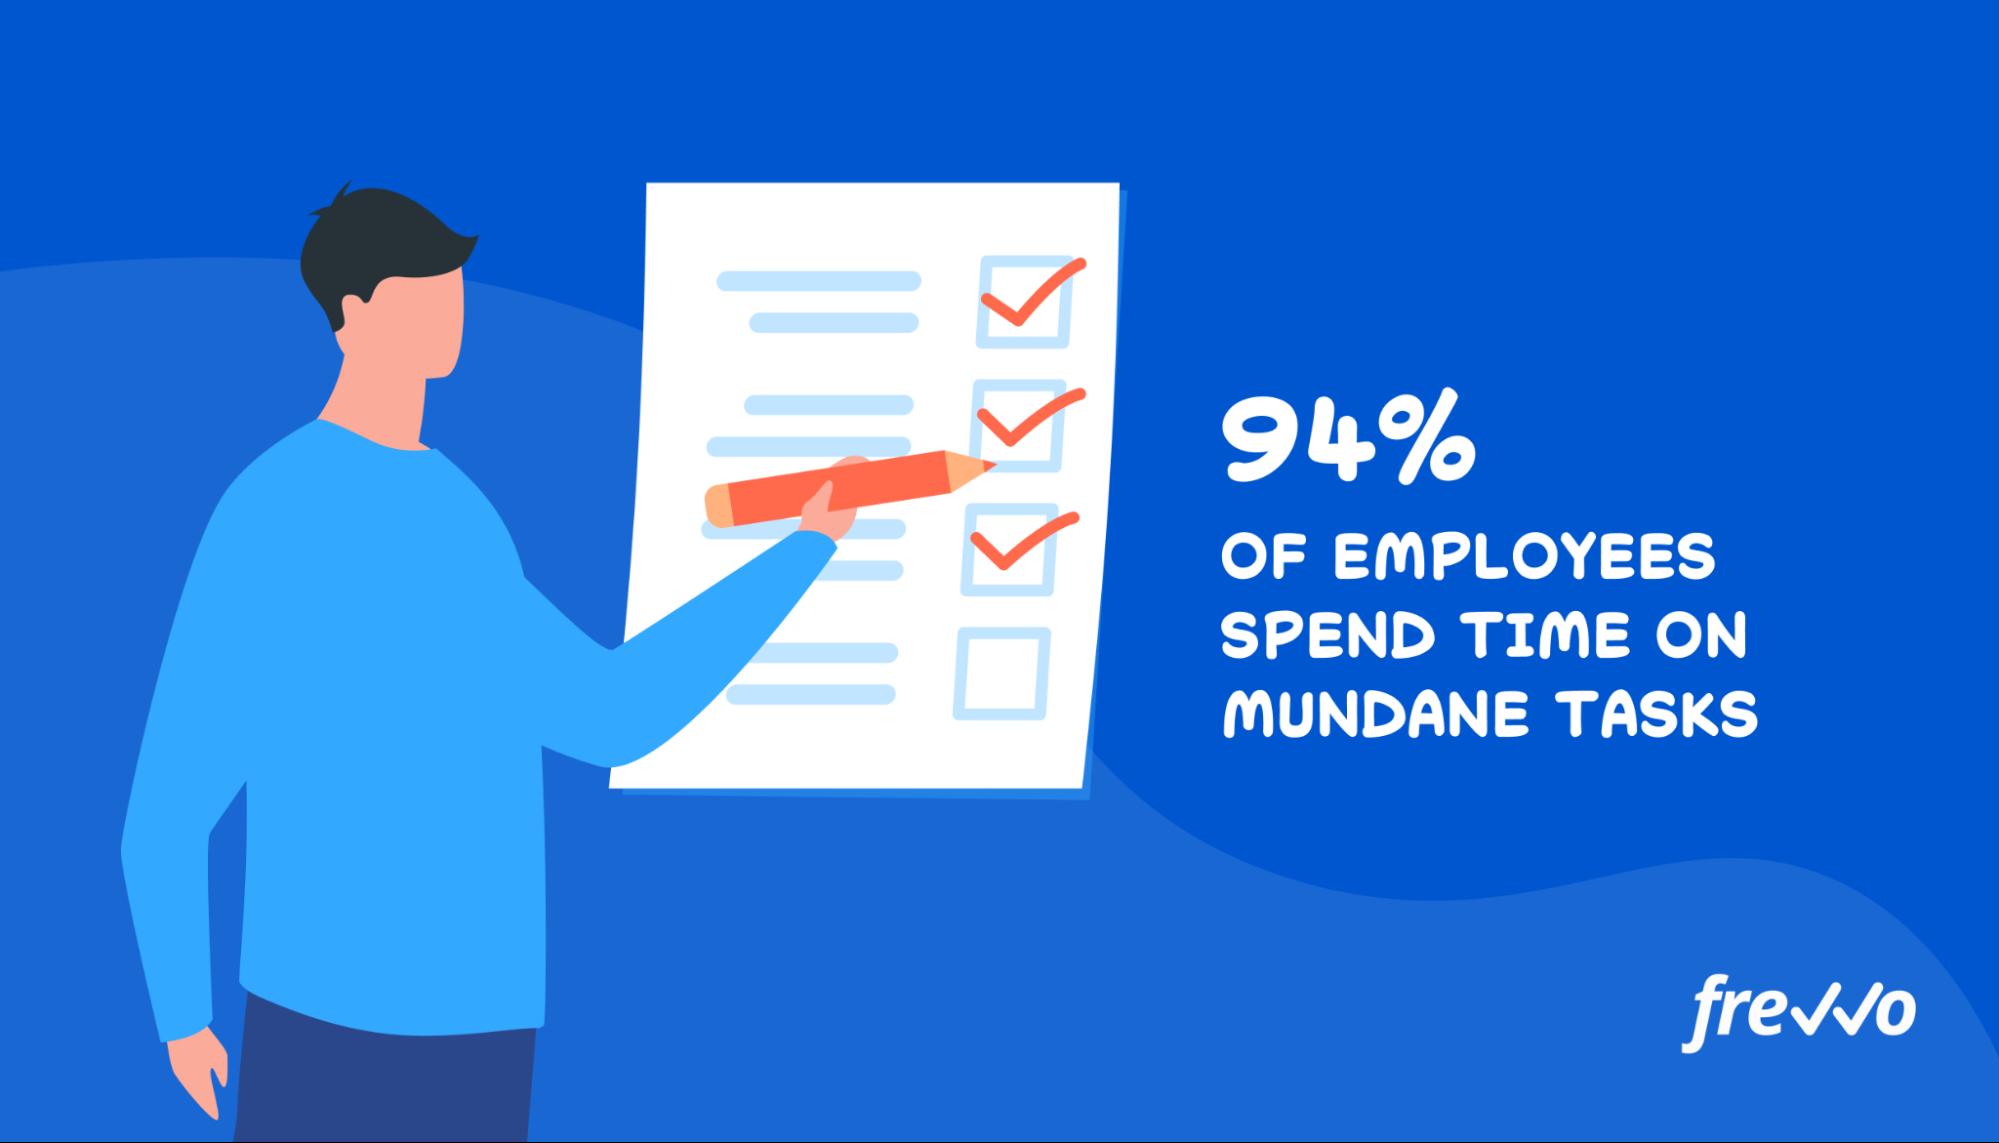 94% of employees spend time on mundane tasks